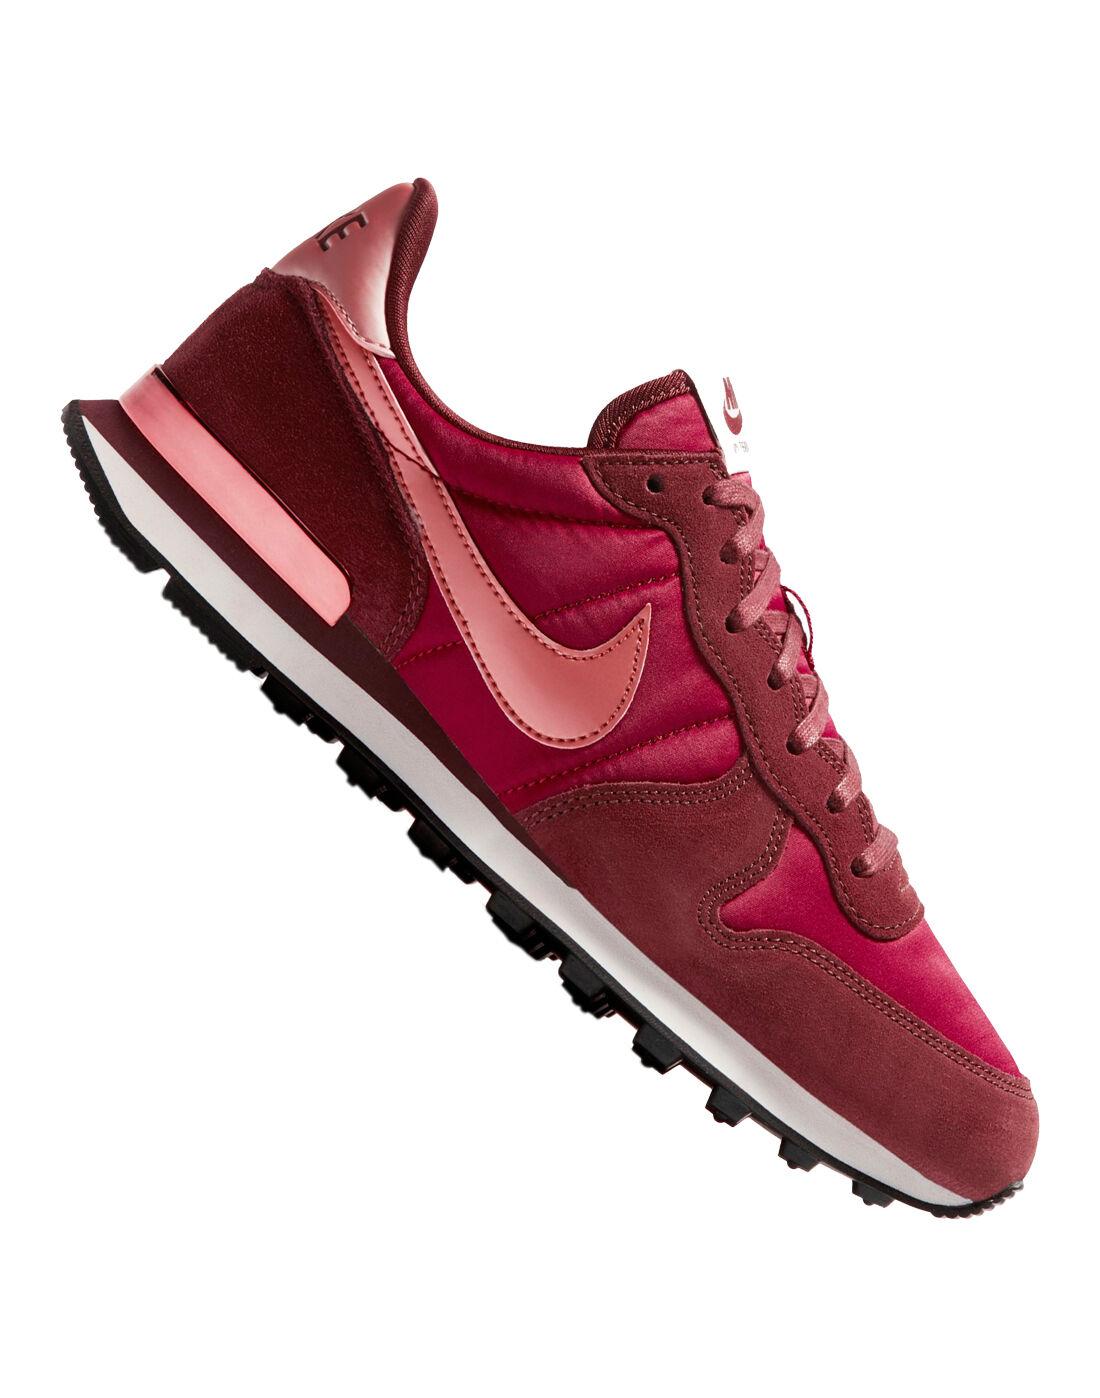 Nike Womens Internationalist | Burgundy